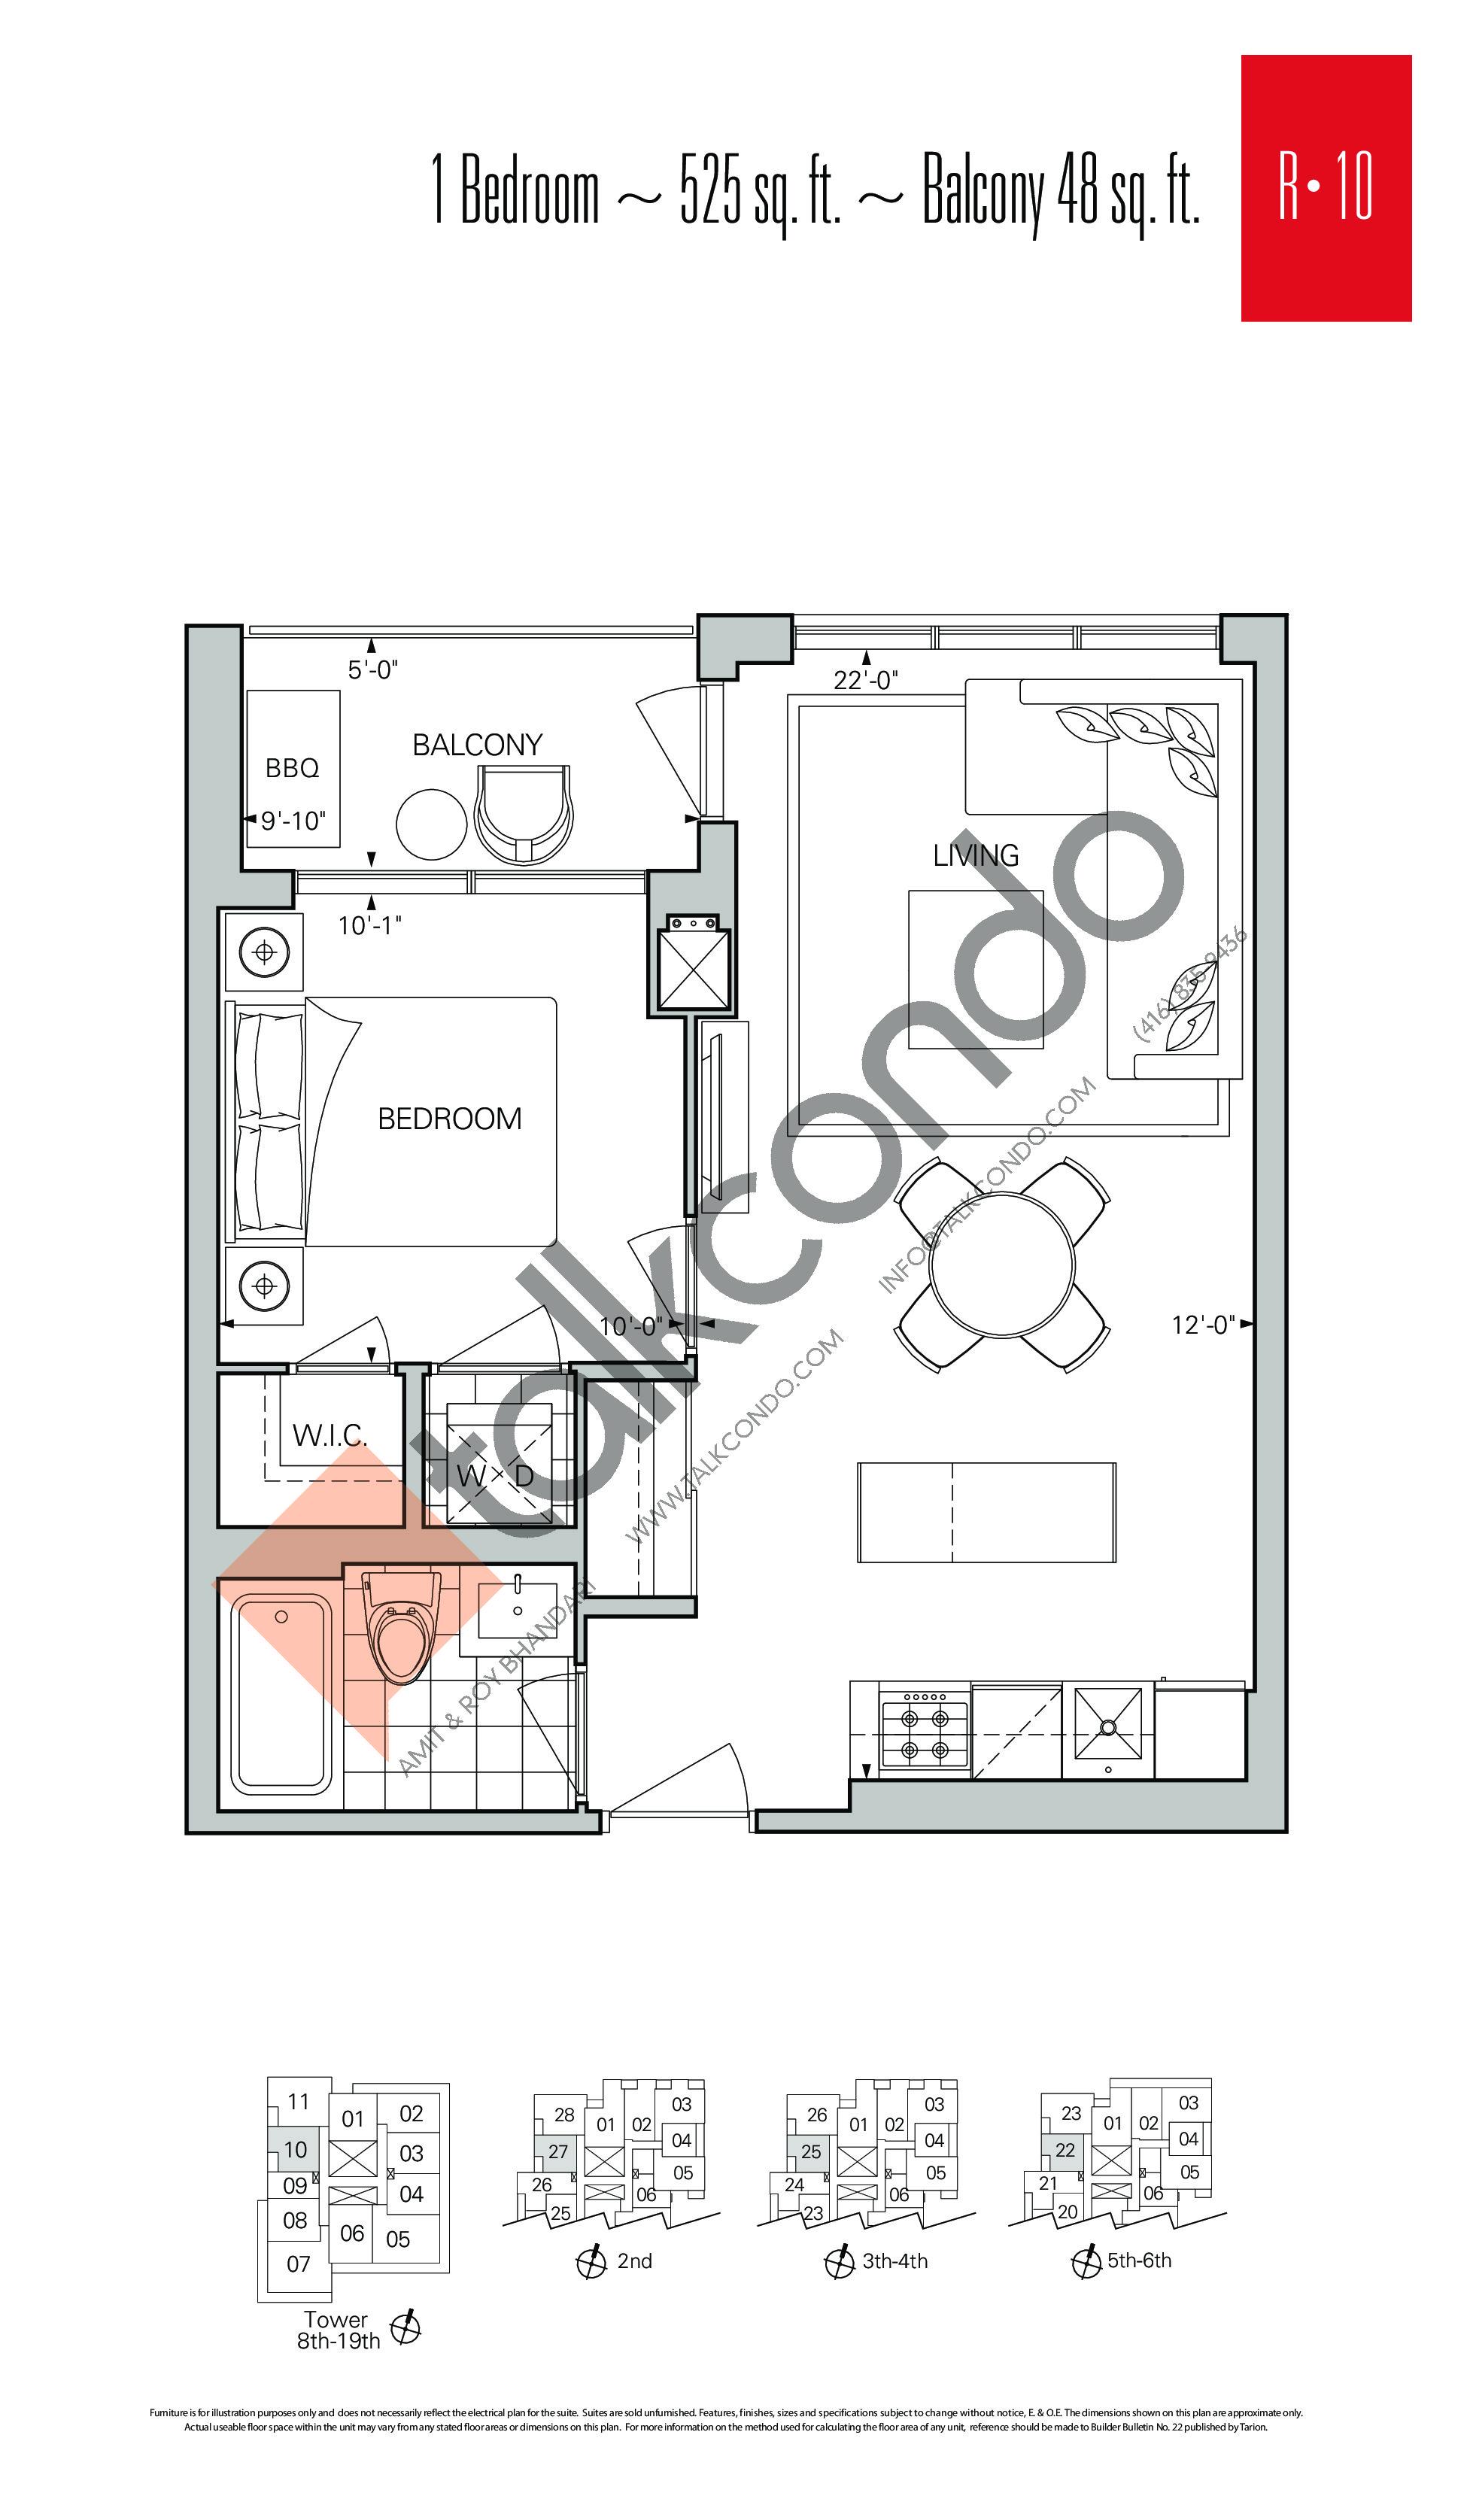 R-10 Floor Plan at Rise Condos - 525 sq.ft